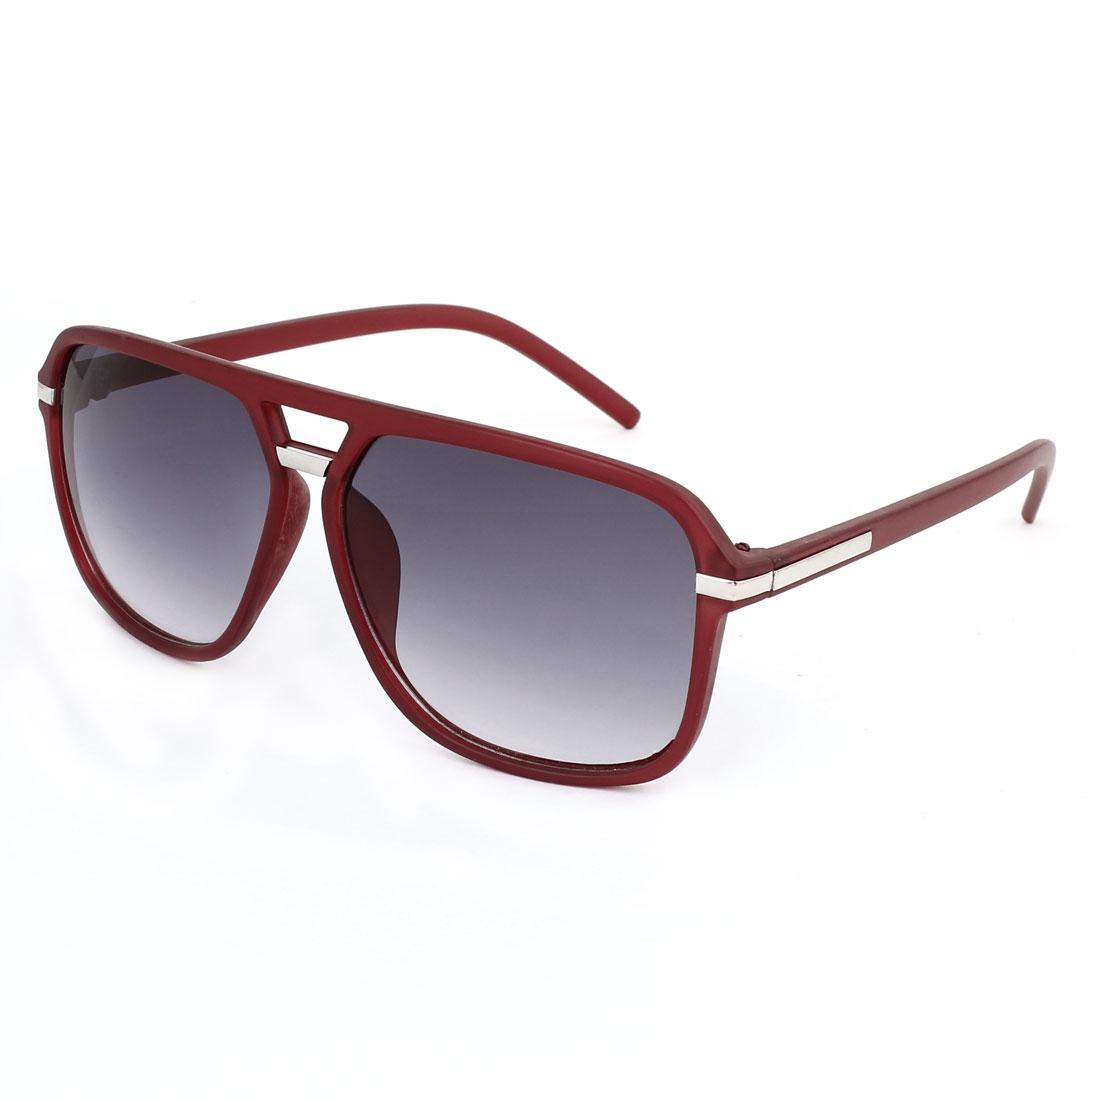 Fashionable Metal Decor Temple Double Bridge Burgundy Plastic Full Rim Frame Square Shape Gradient Gray Lens Leisure Eyeglasses Sun Glasses